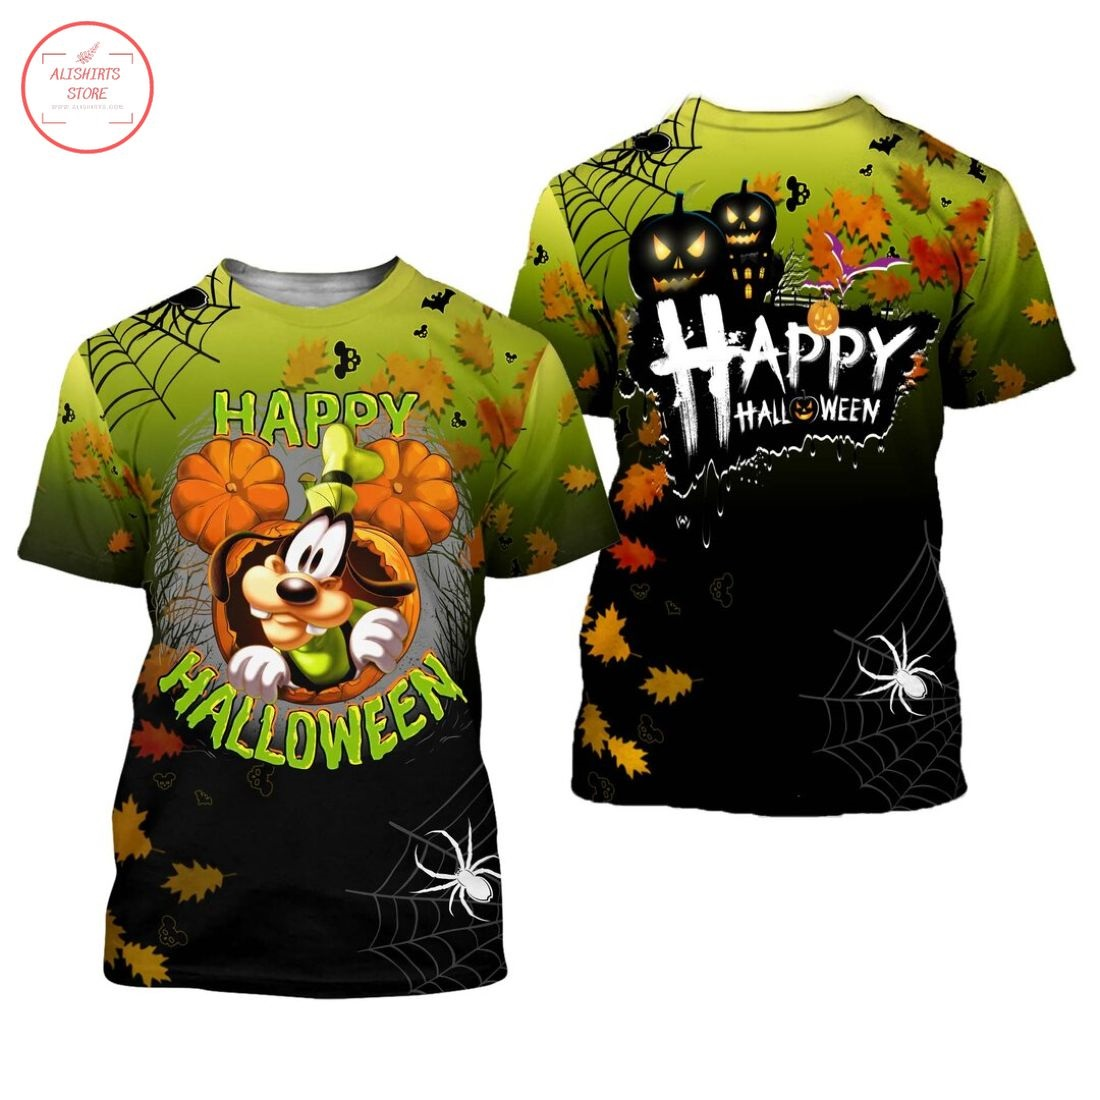 Goofy Disney Happy Halloween Shirt